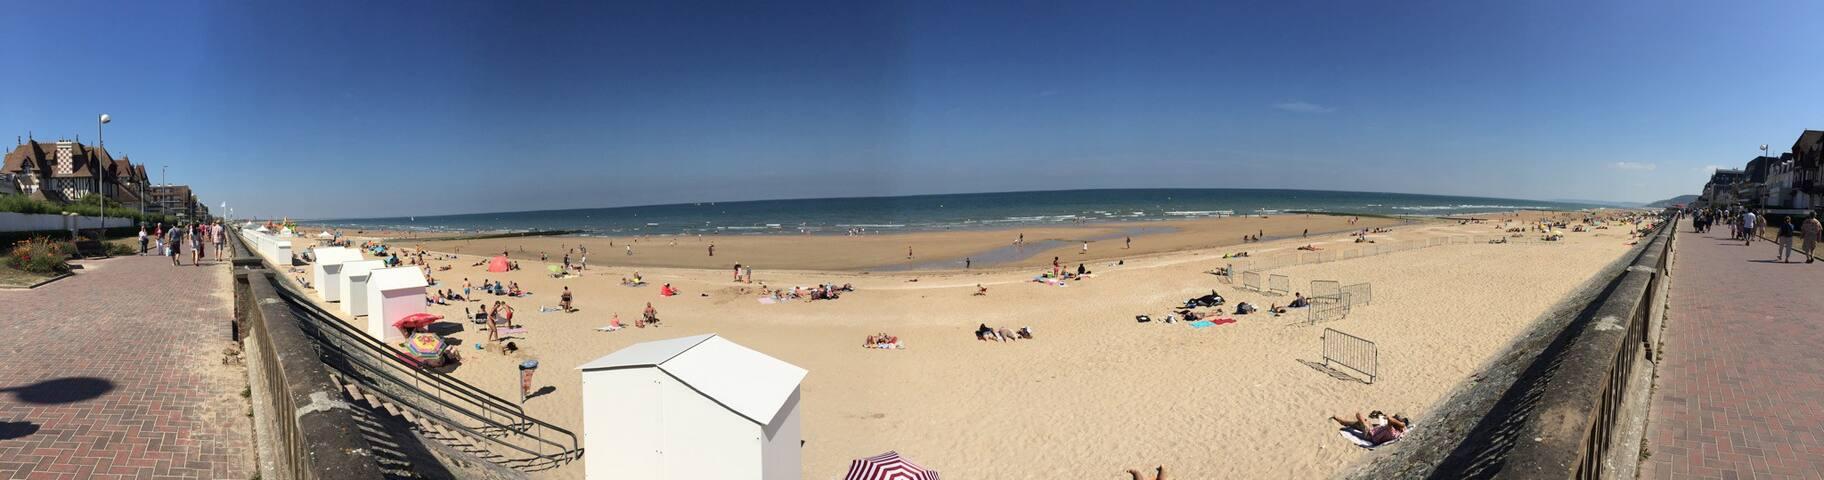 Apprt de 80m² à 10mn de la plage du CAROUBIER